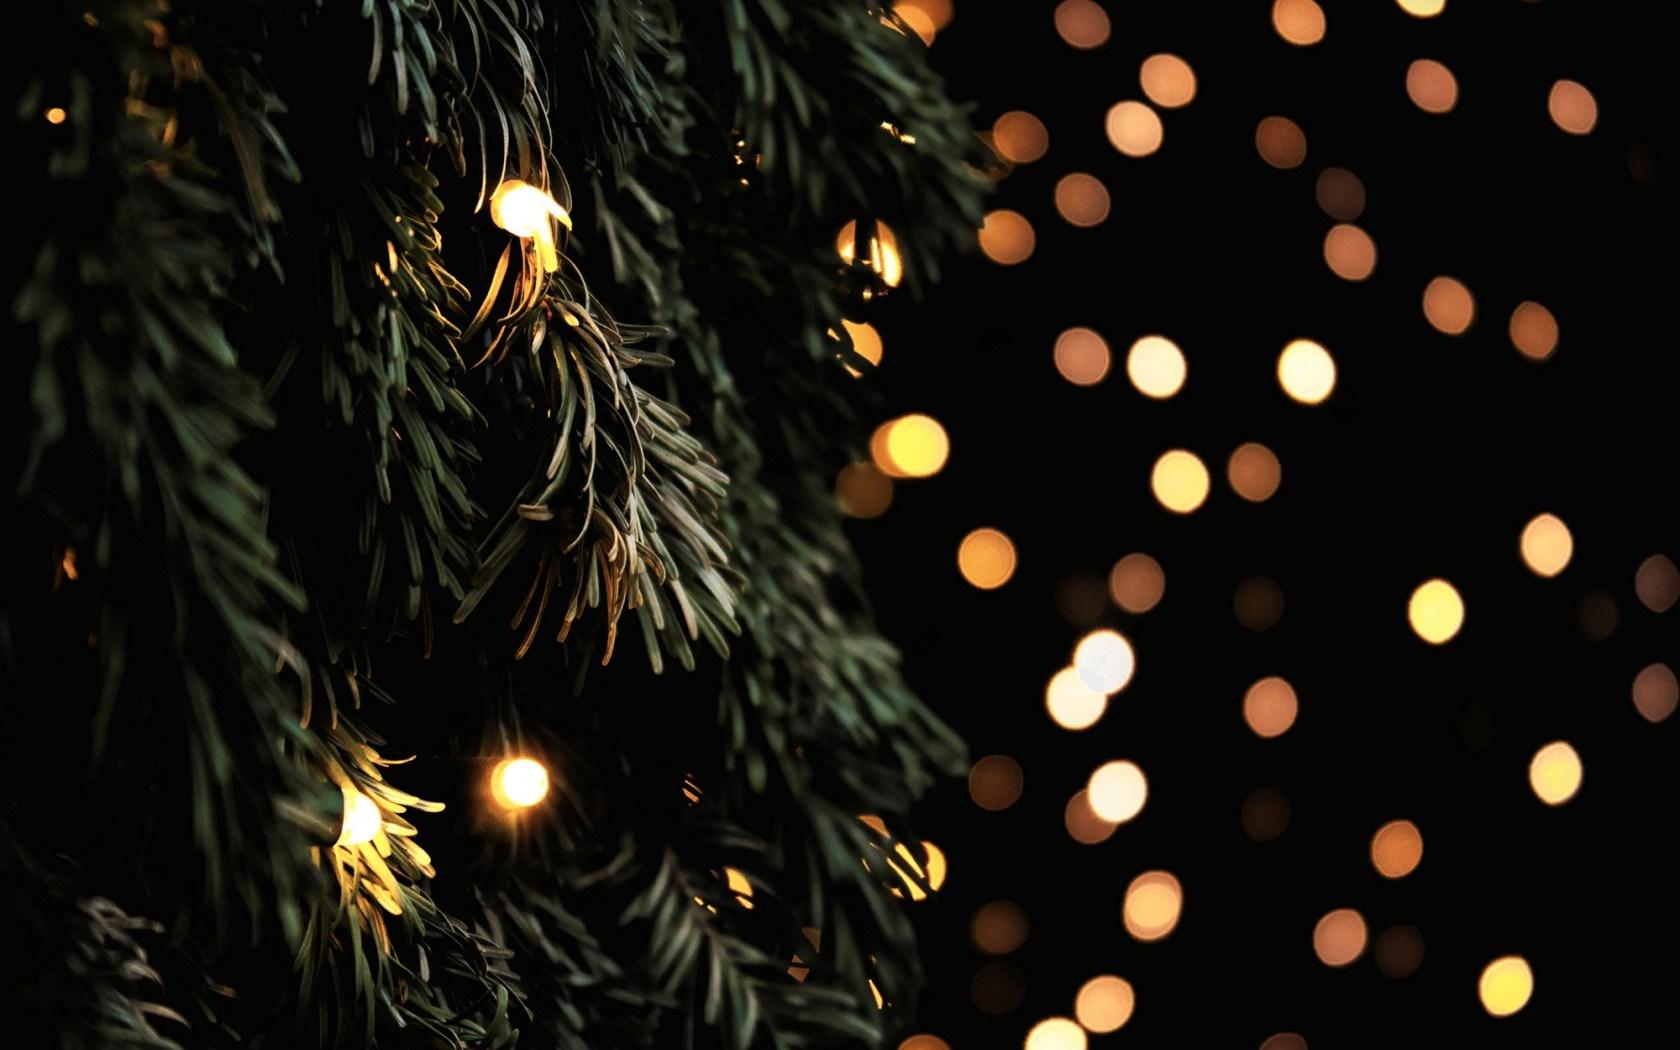 Tree Fir Branches Garland Lights New Year